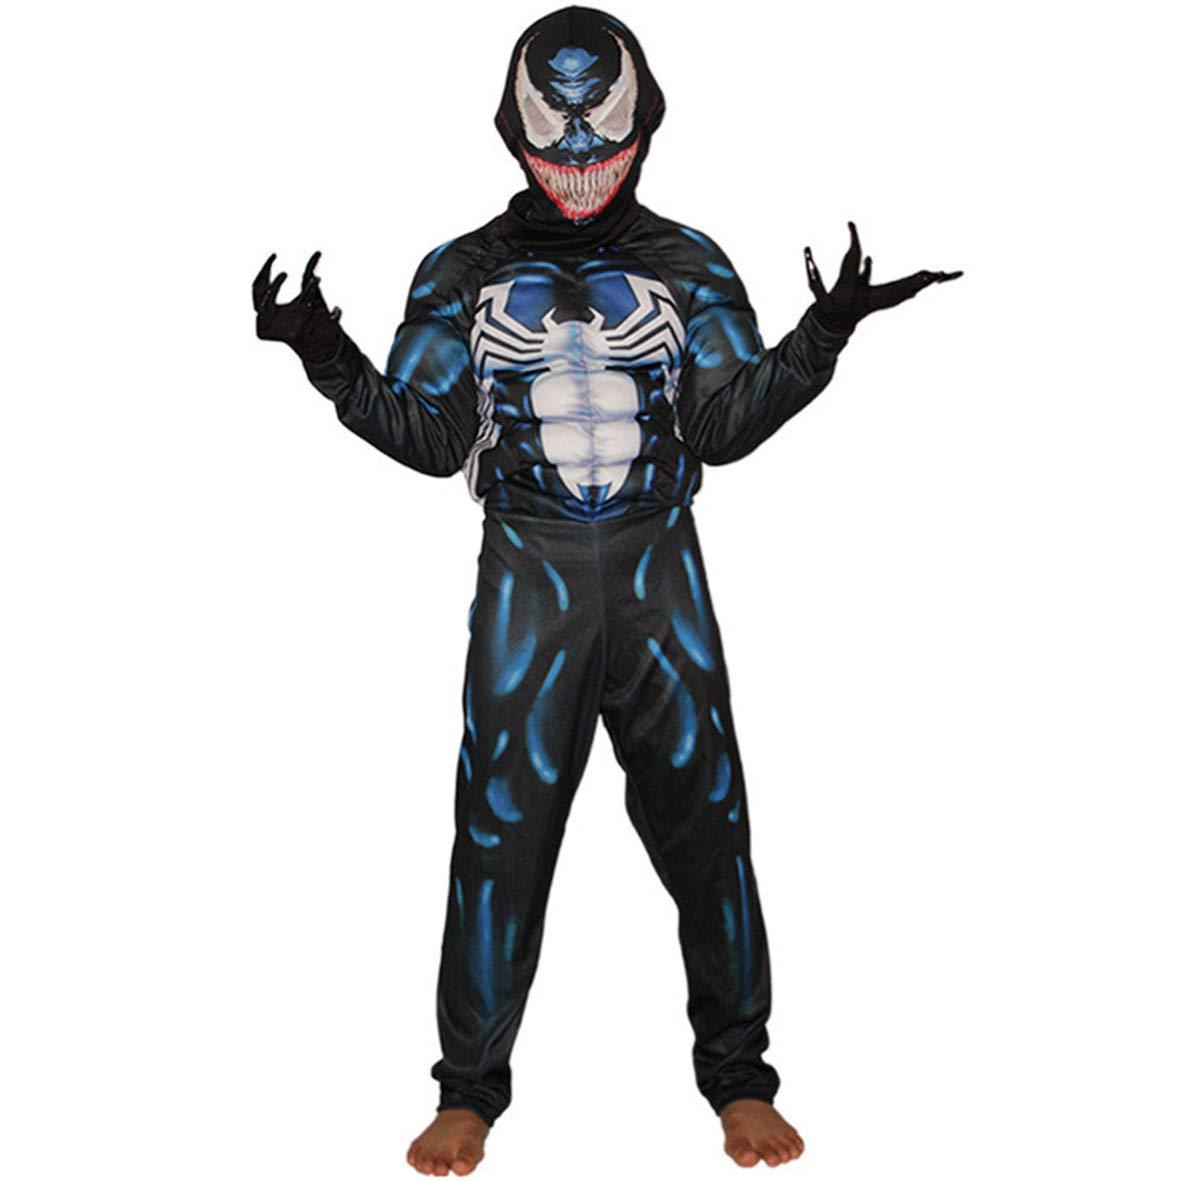 Amazon.com: Venom Disfraz de Venom Película personaje ...